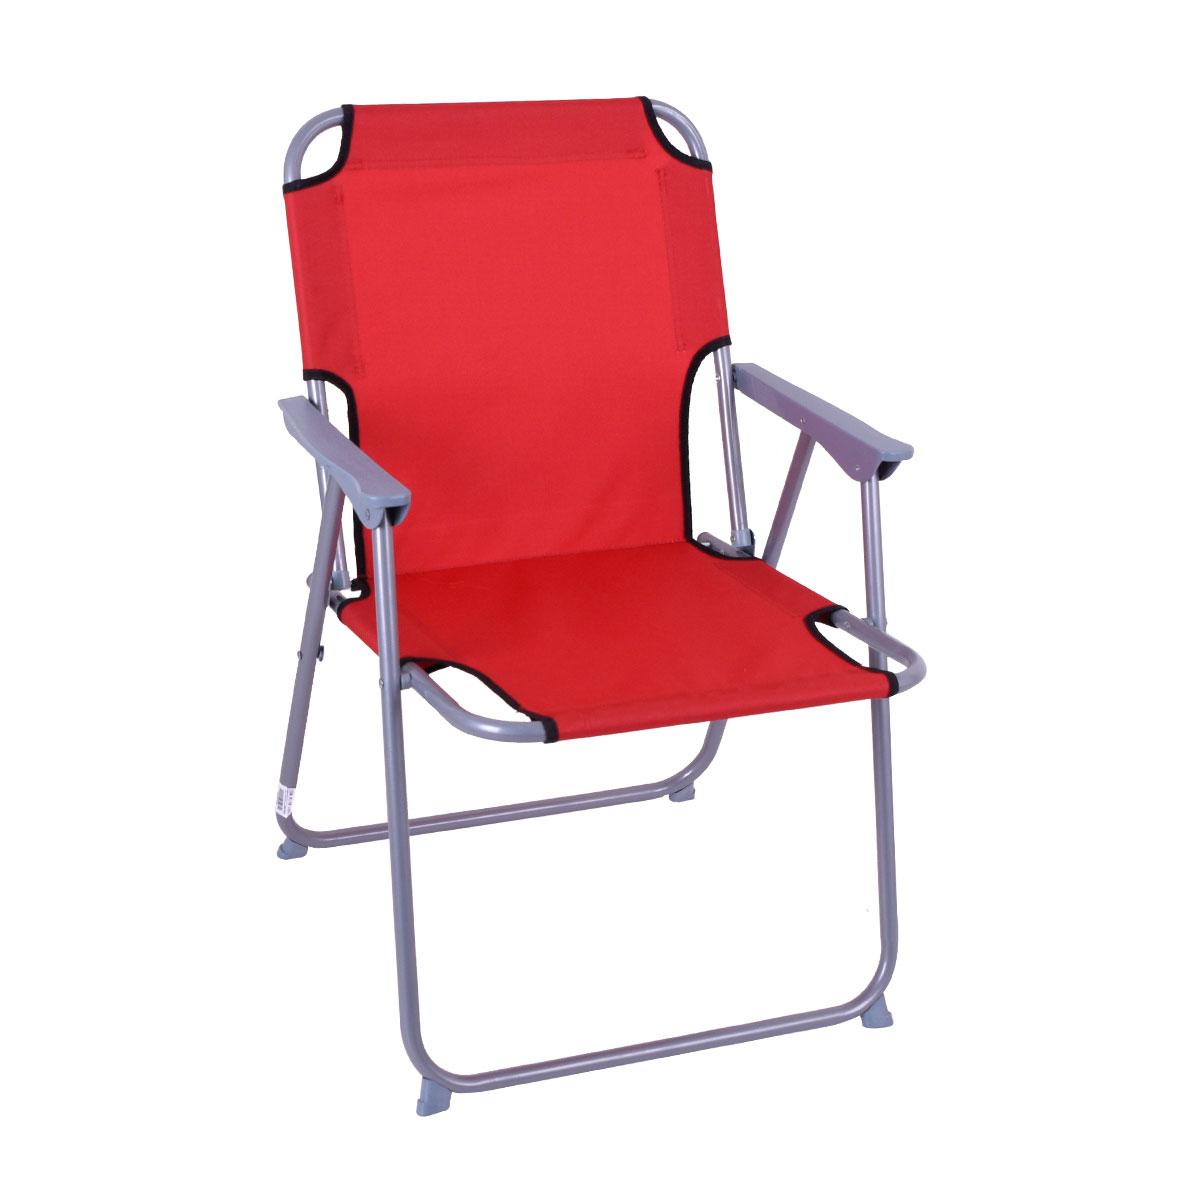 كرسي رحلات بذراعين قابل للطي رقم 16997- من ماي مارت